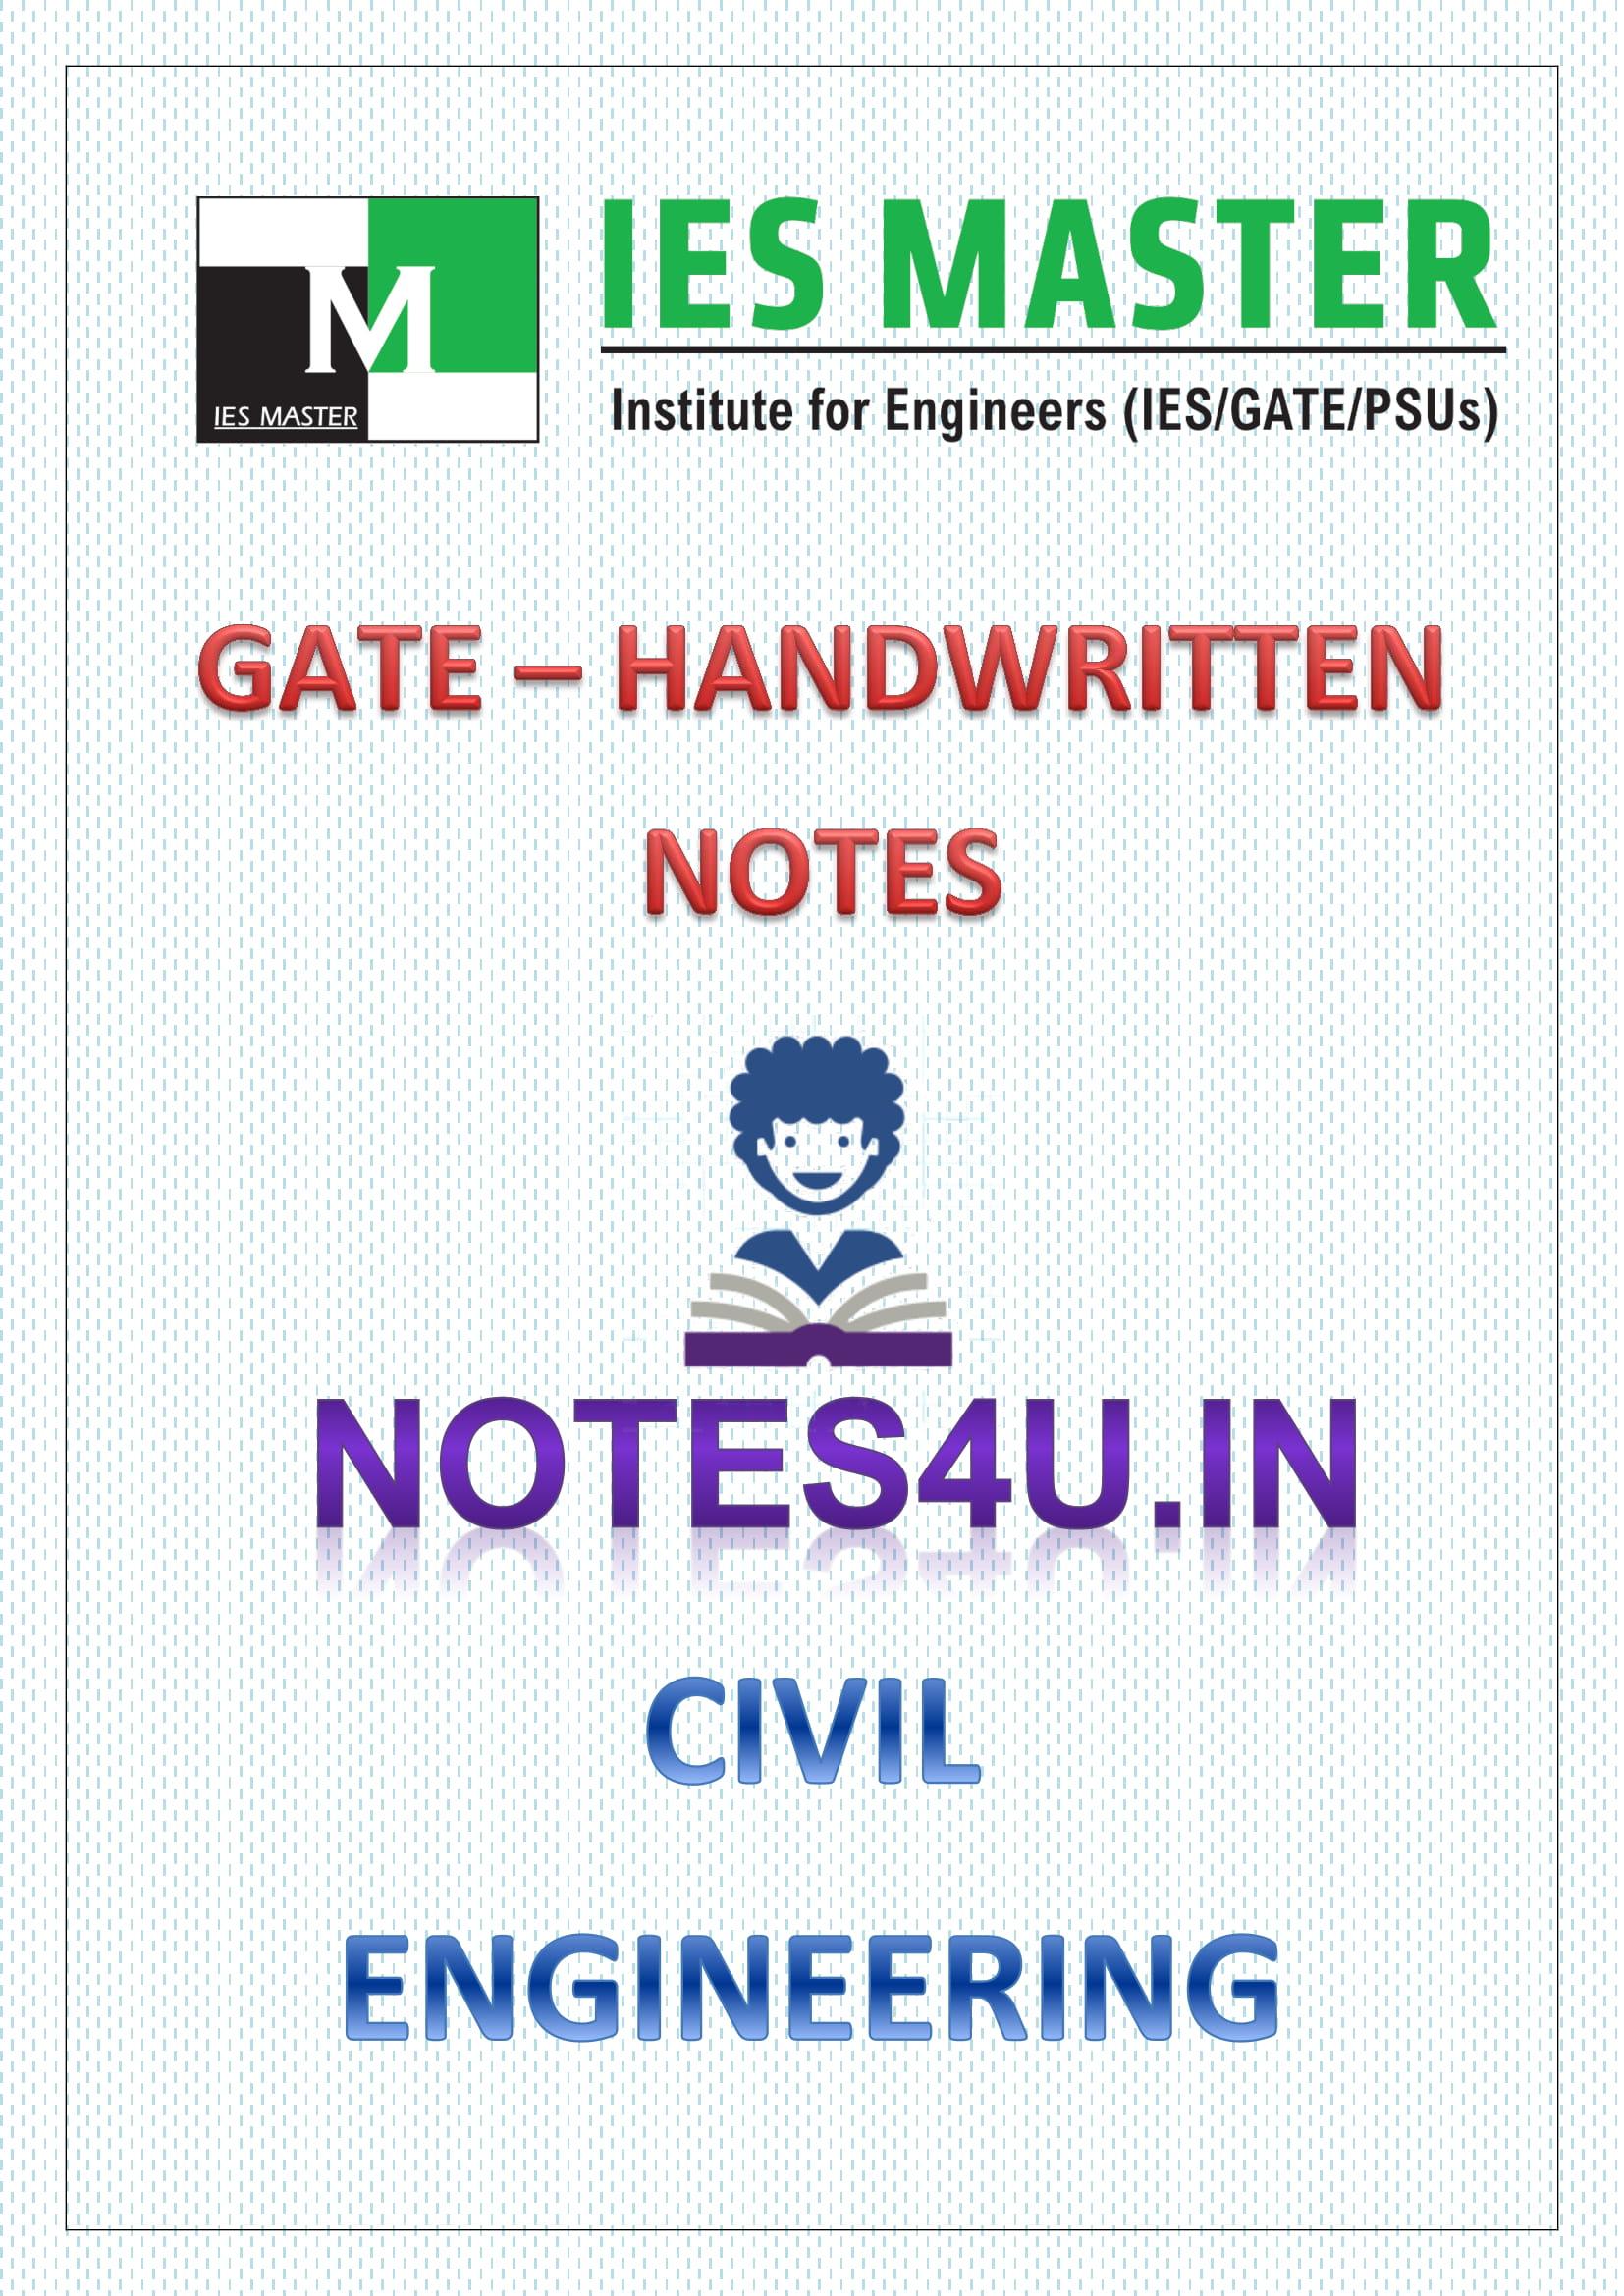 Civil Engineering IES MASTER HANDWRITTEN NOTES